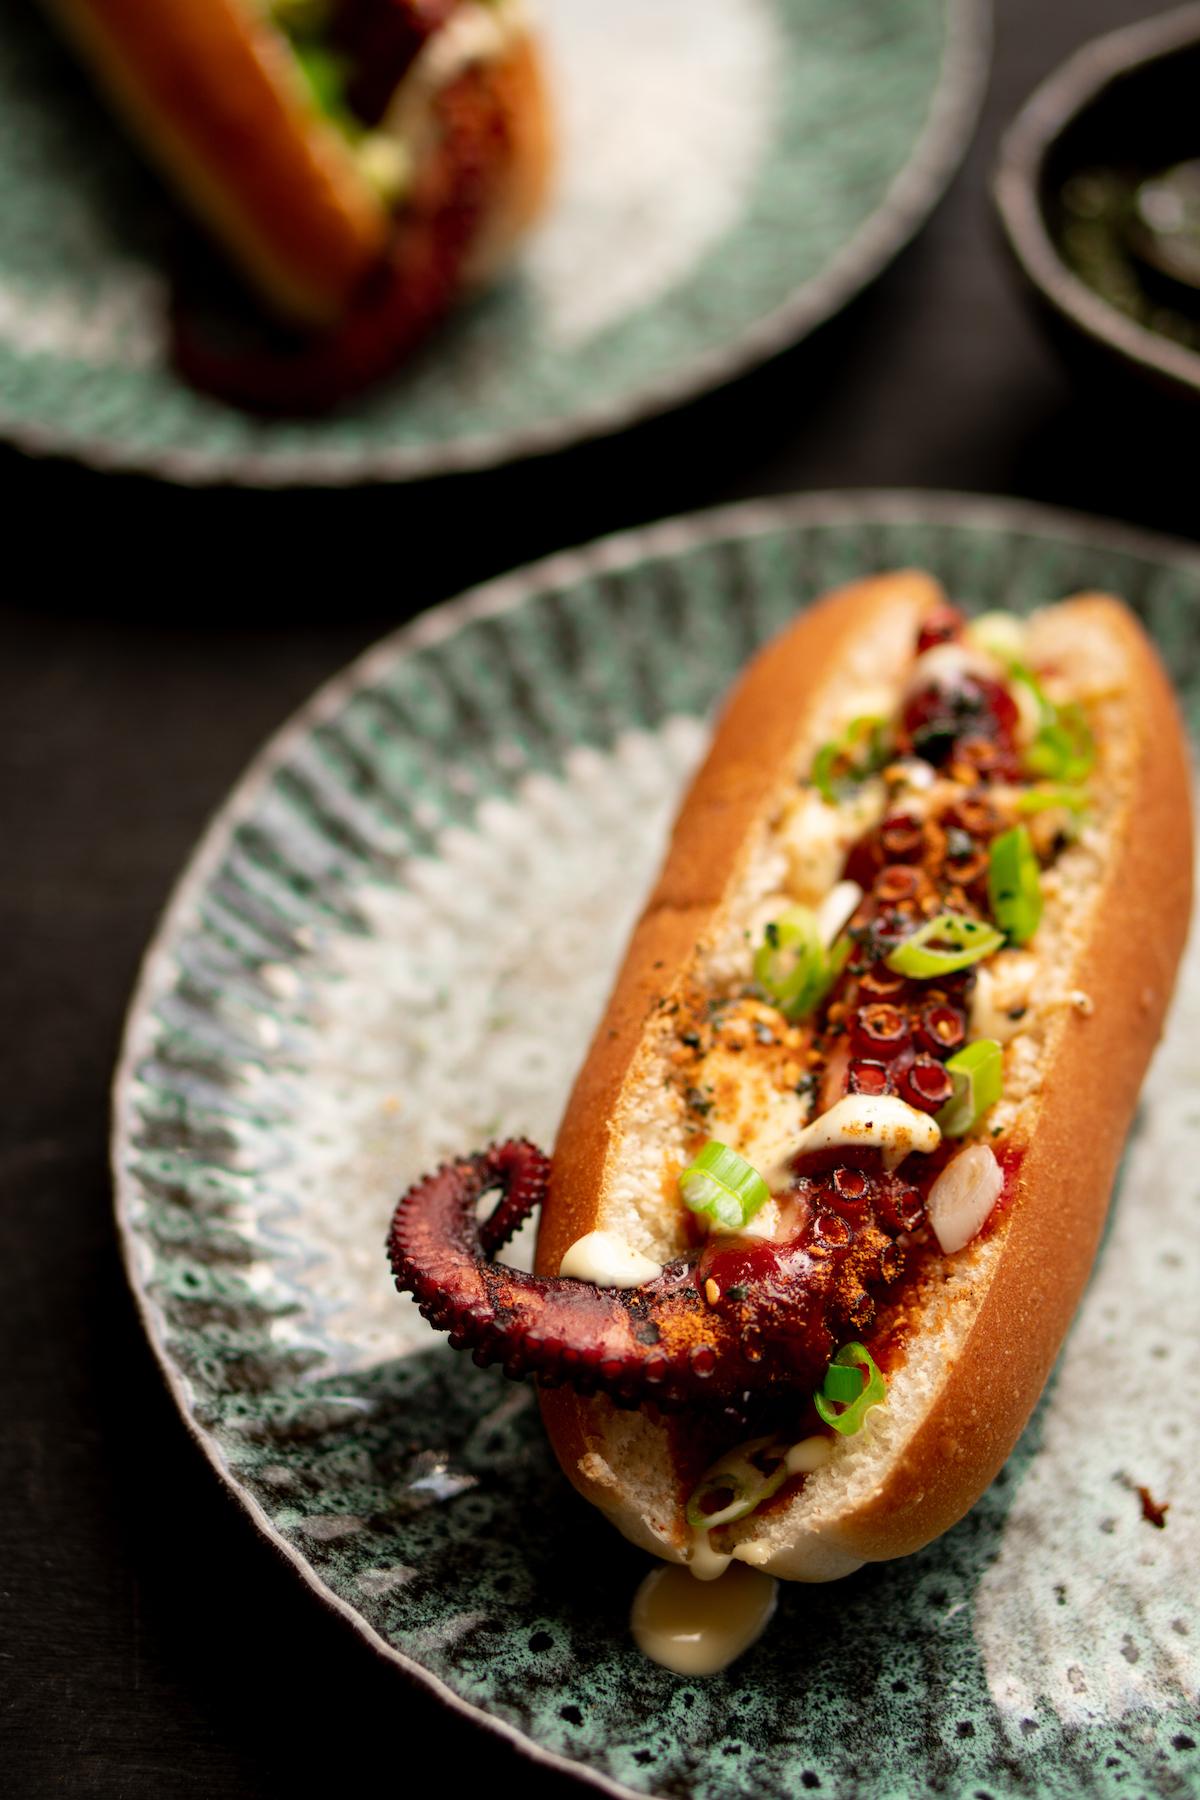 octodog (hotdog met octopus)